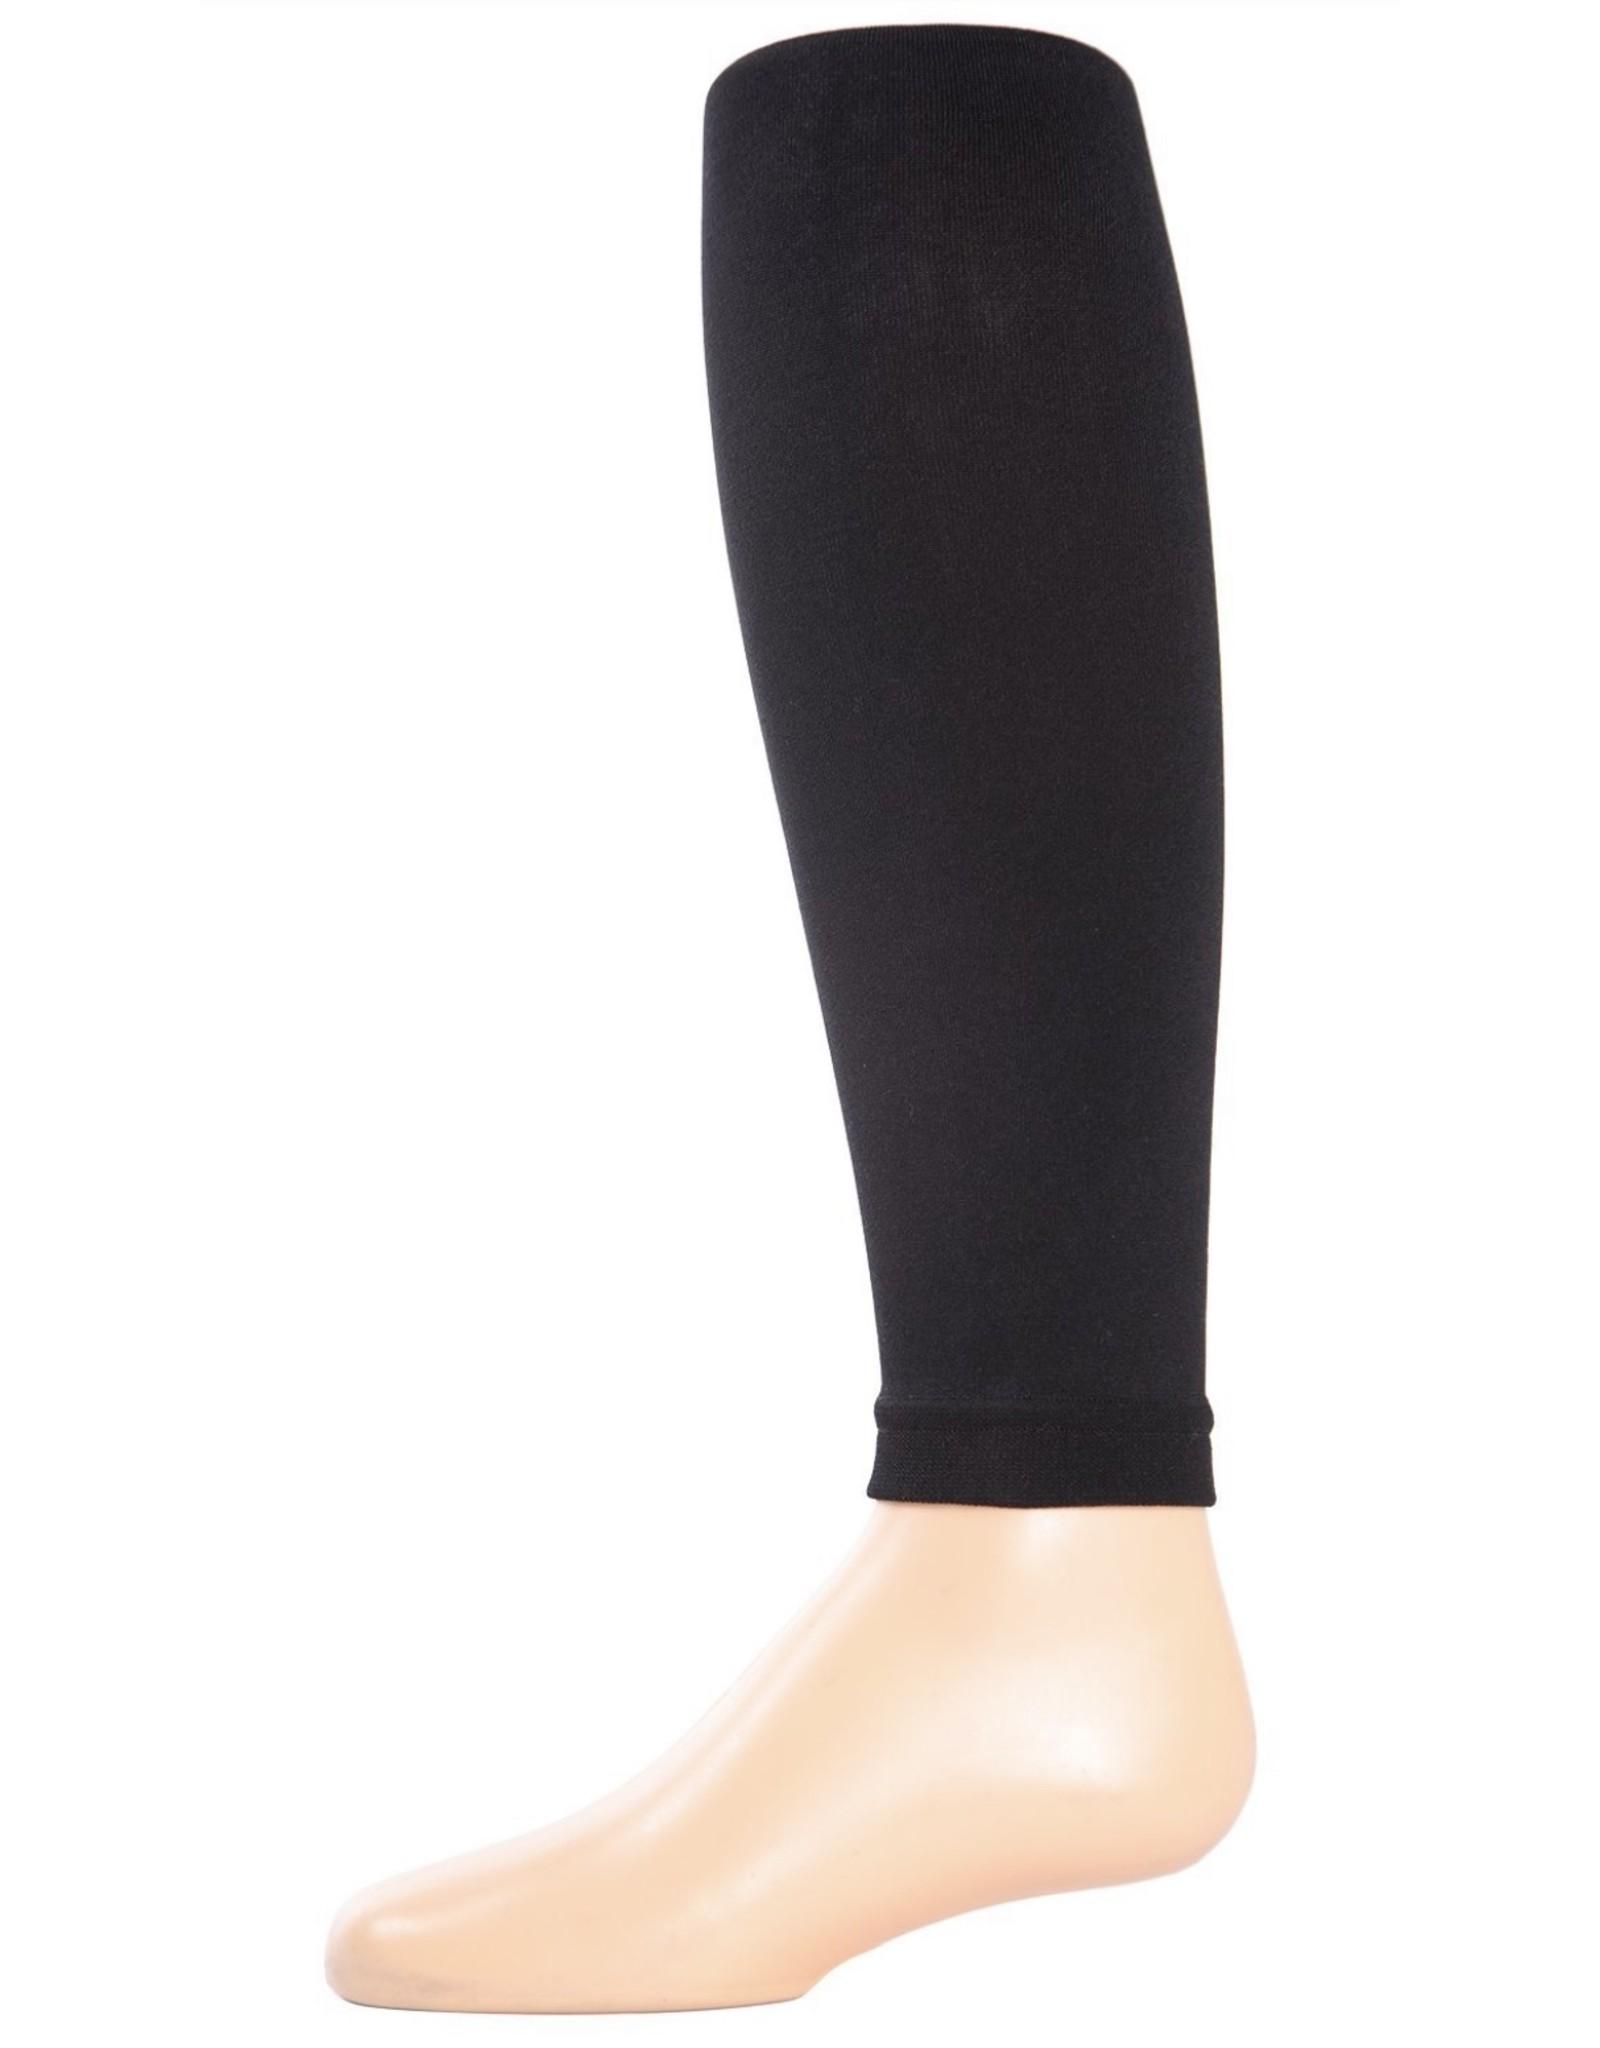 Memoi Memoi Girls Opaque Footless Tights Mk-211